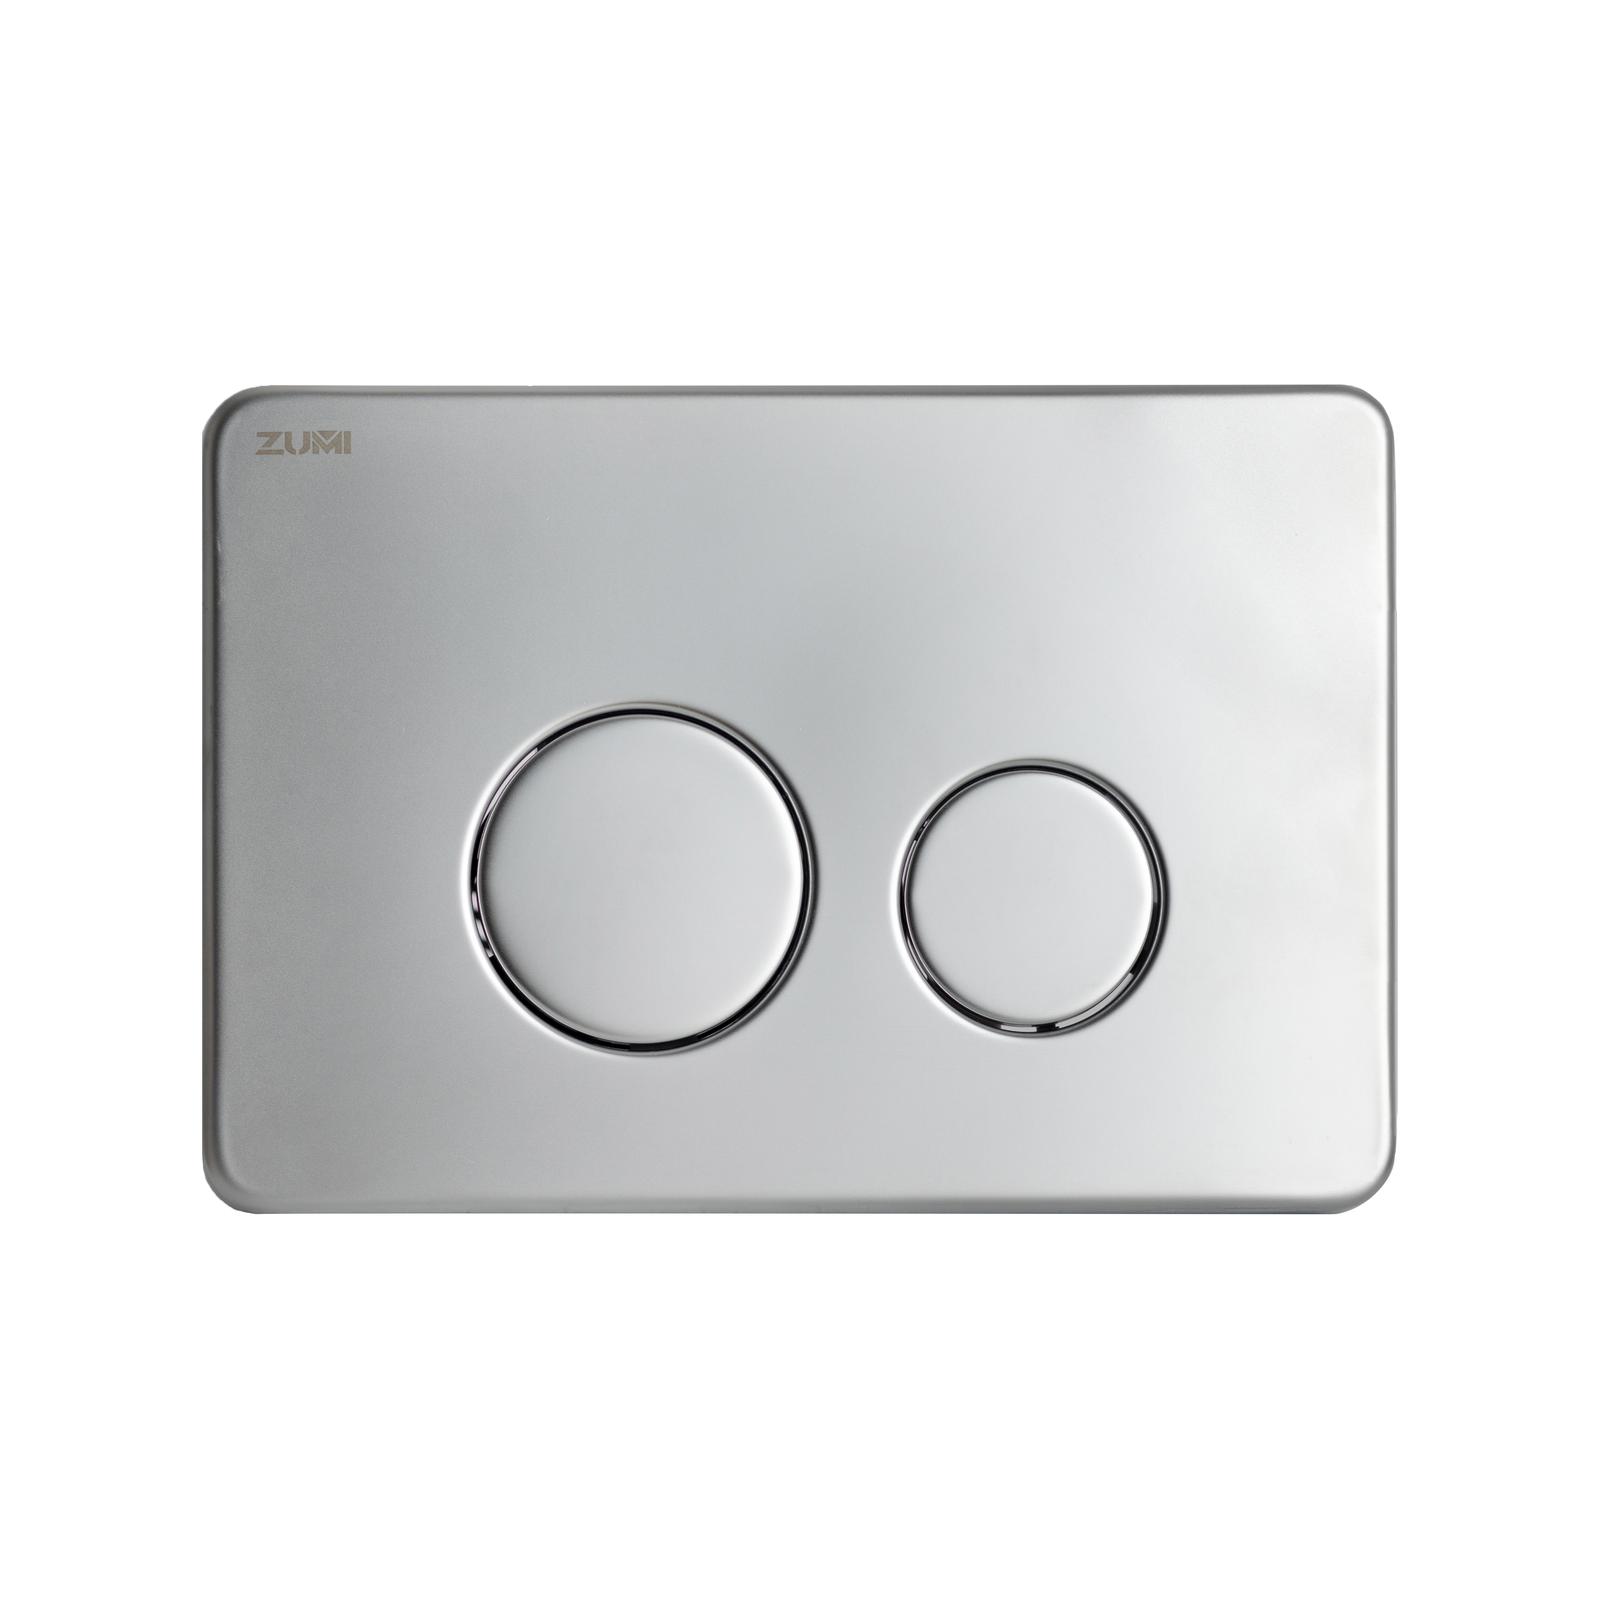 Zumi Satin Chrome Stainless Steel Flush Plate